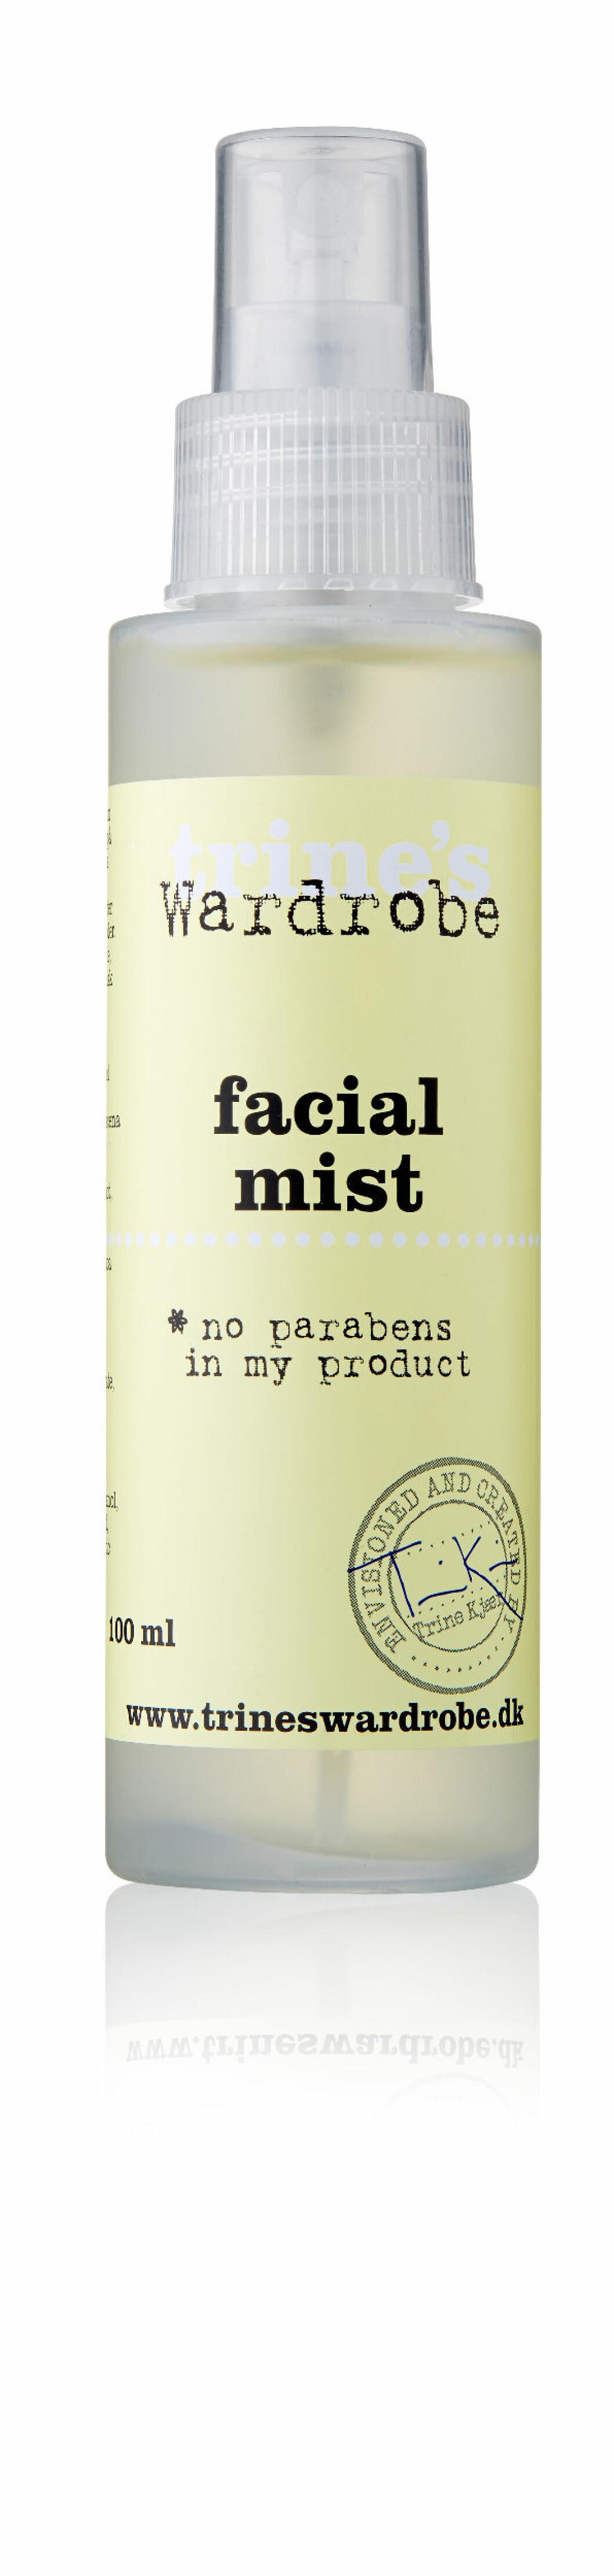 Facial Mist fra Trines Wardrobe Skin Care, kr 99. Foto: Produsenten